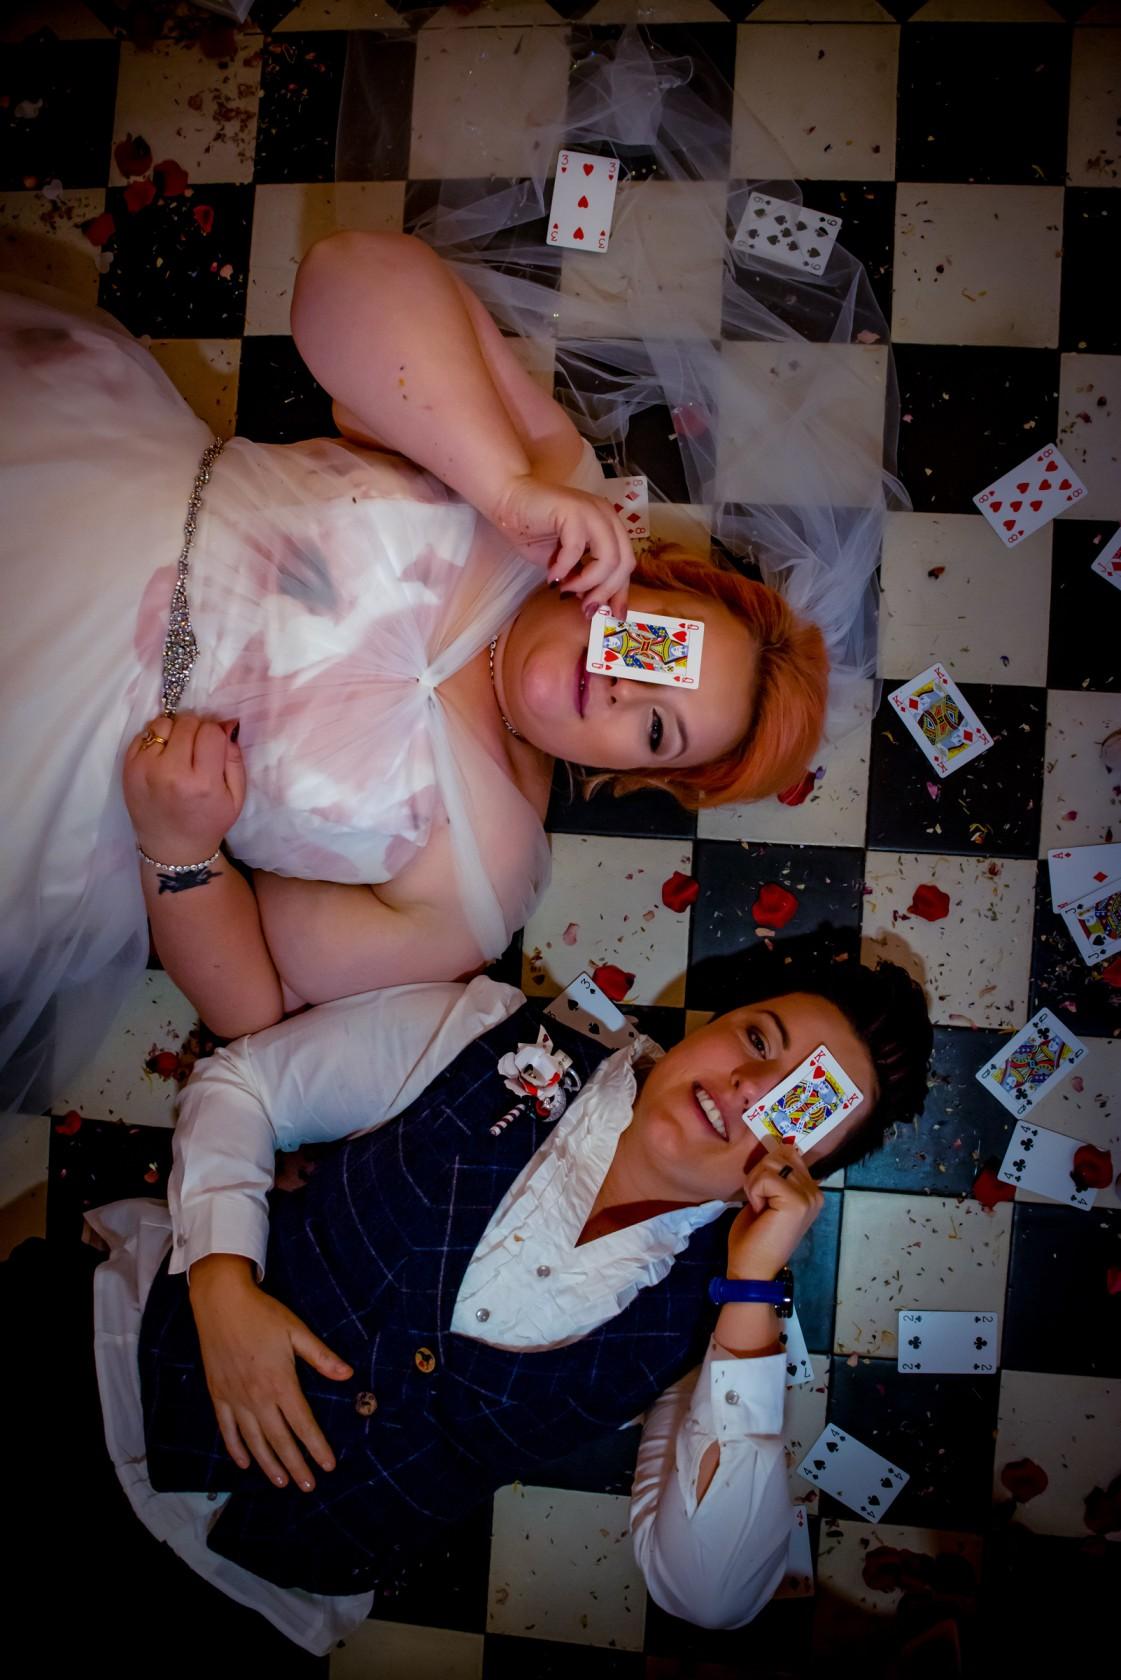 alice in wonderland wedding - wonderland wedding - real wedding inspiration - DIY wedding - romantic wedding - same sex wedding - unconventional wedding